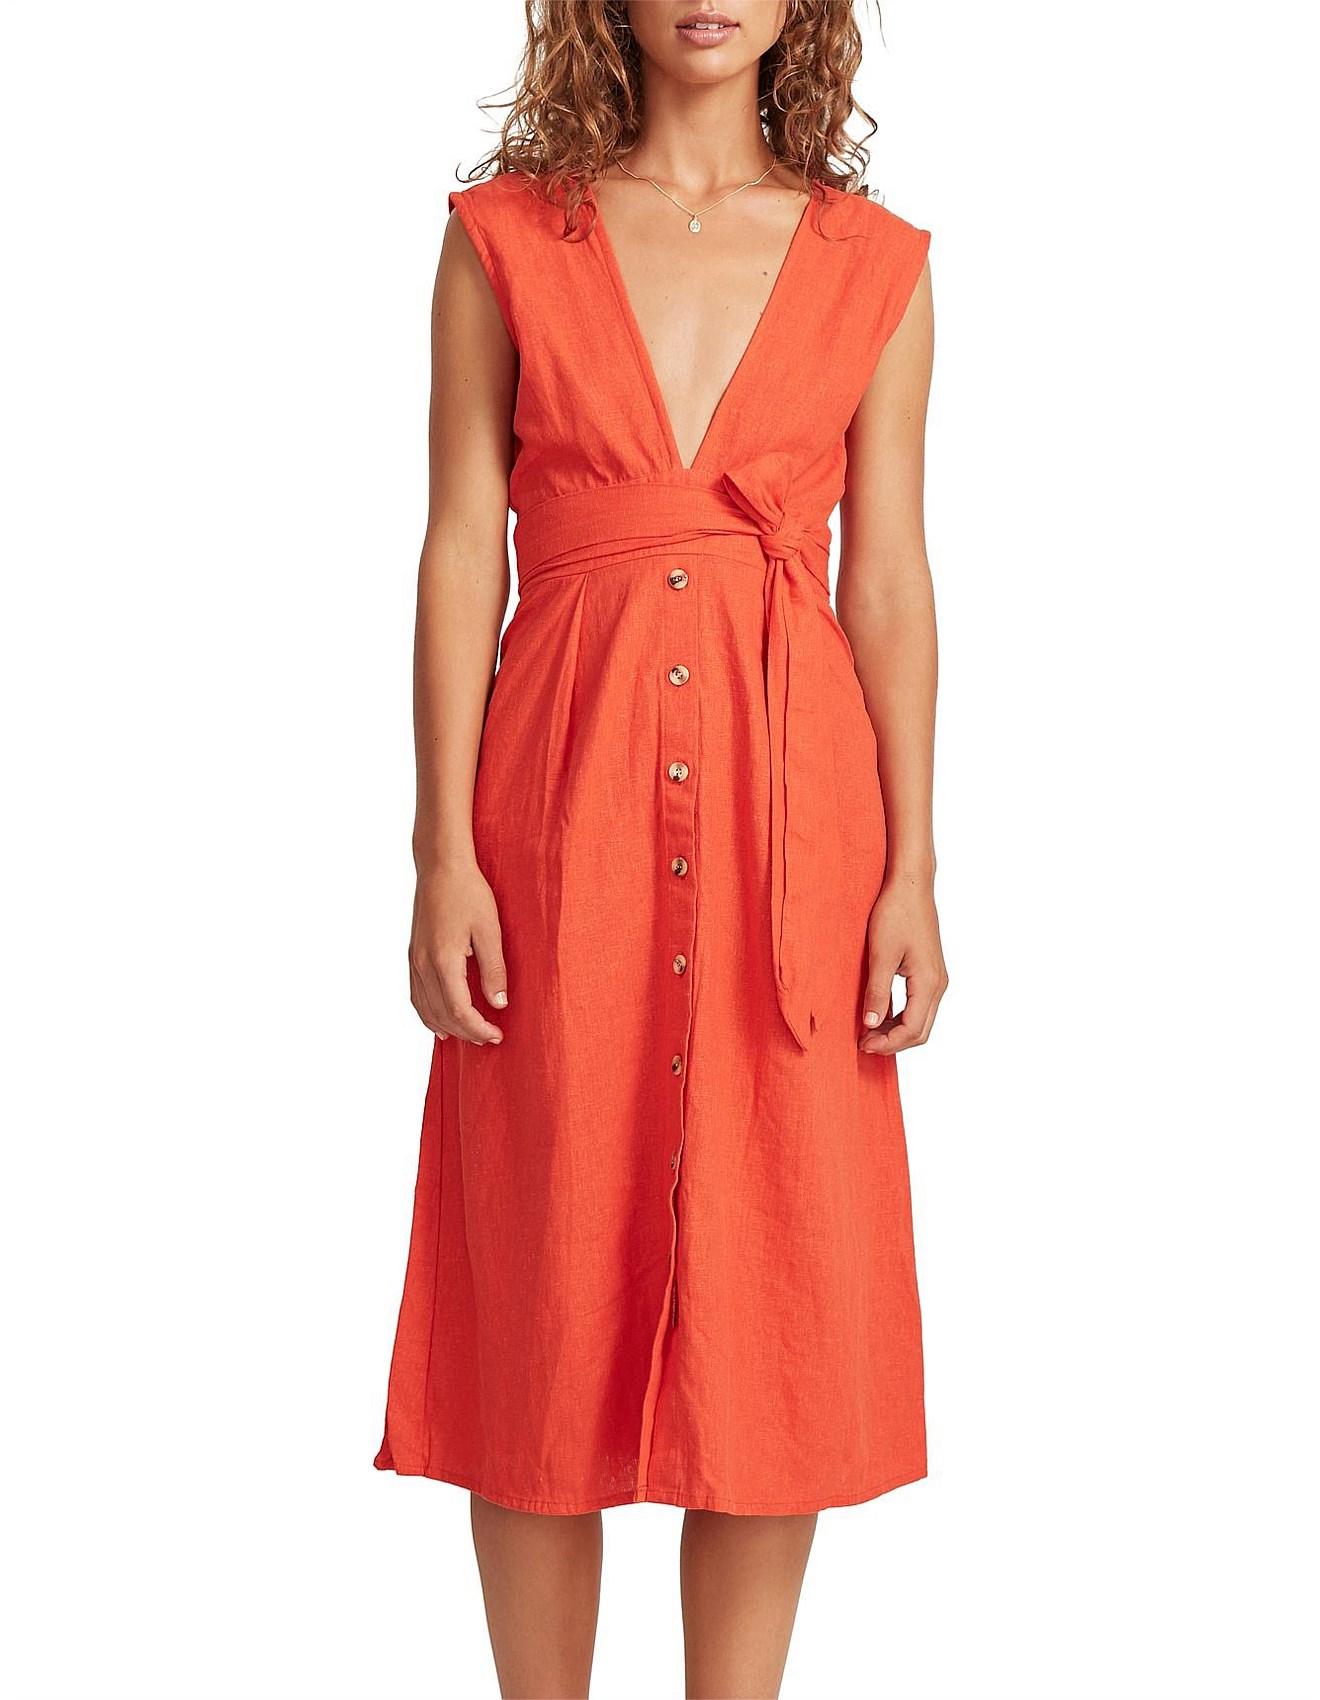 b8b70a90589 Le Roch Midi Dress